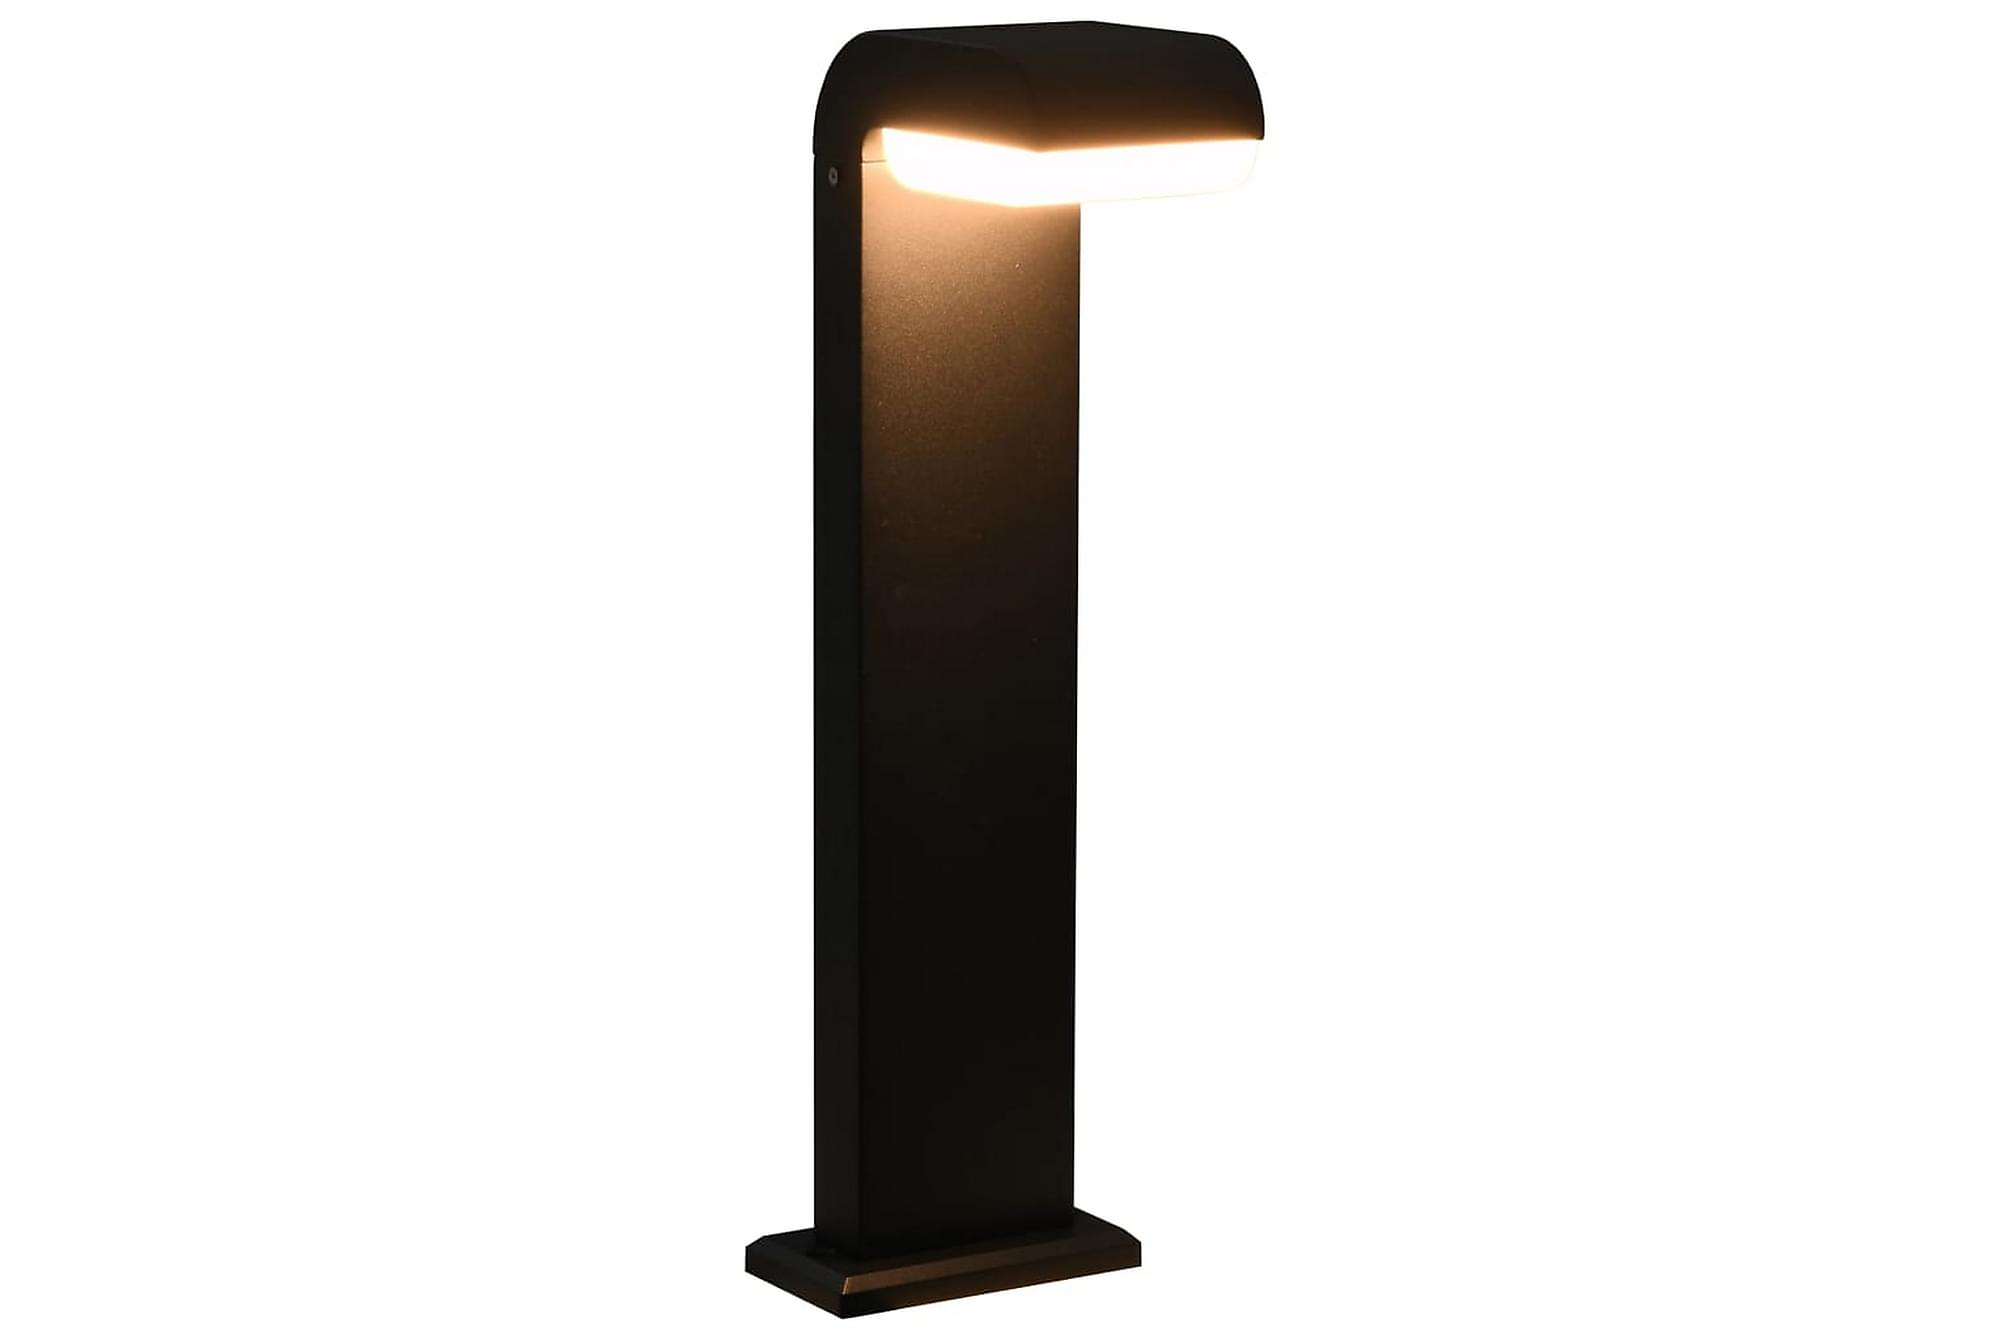 Utomhuslampa med LED 9 W svart oval